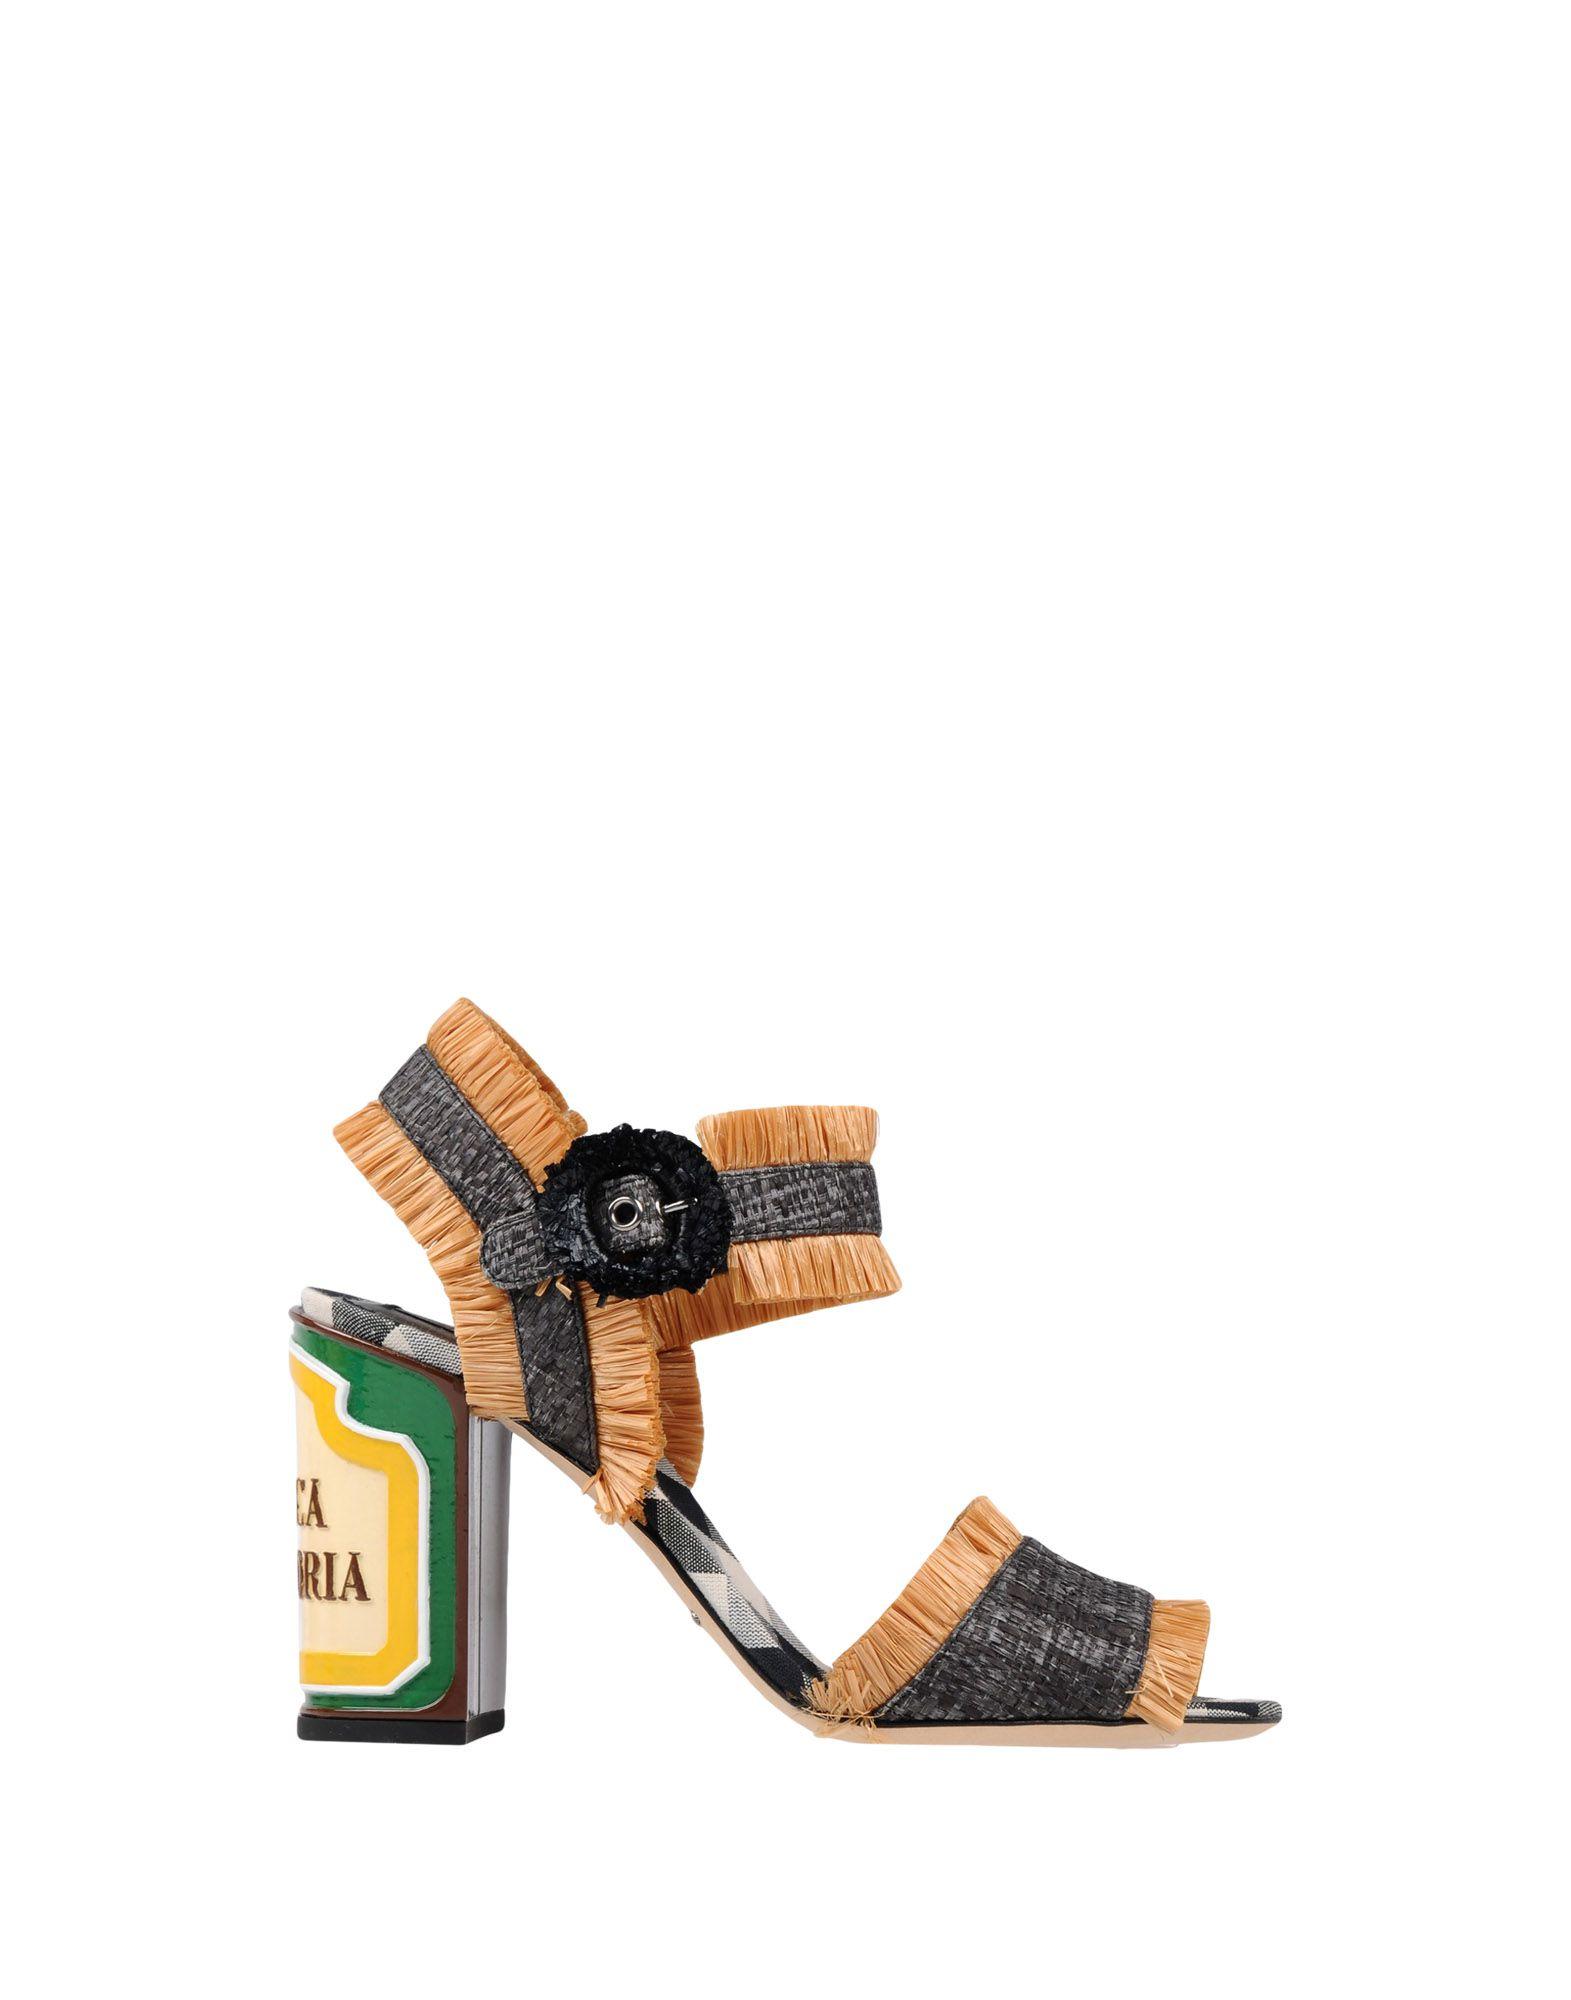 Dolce & Gabbana Sandalen Damen Gutes Preis-Leistungs-Verhältnis, Preis-Leistungs-Verhältnis, Preis-Leistungs-Verhältnis, es lohnt sich 2773 d56a04